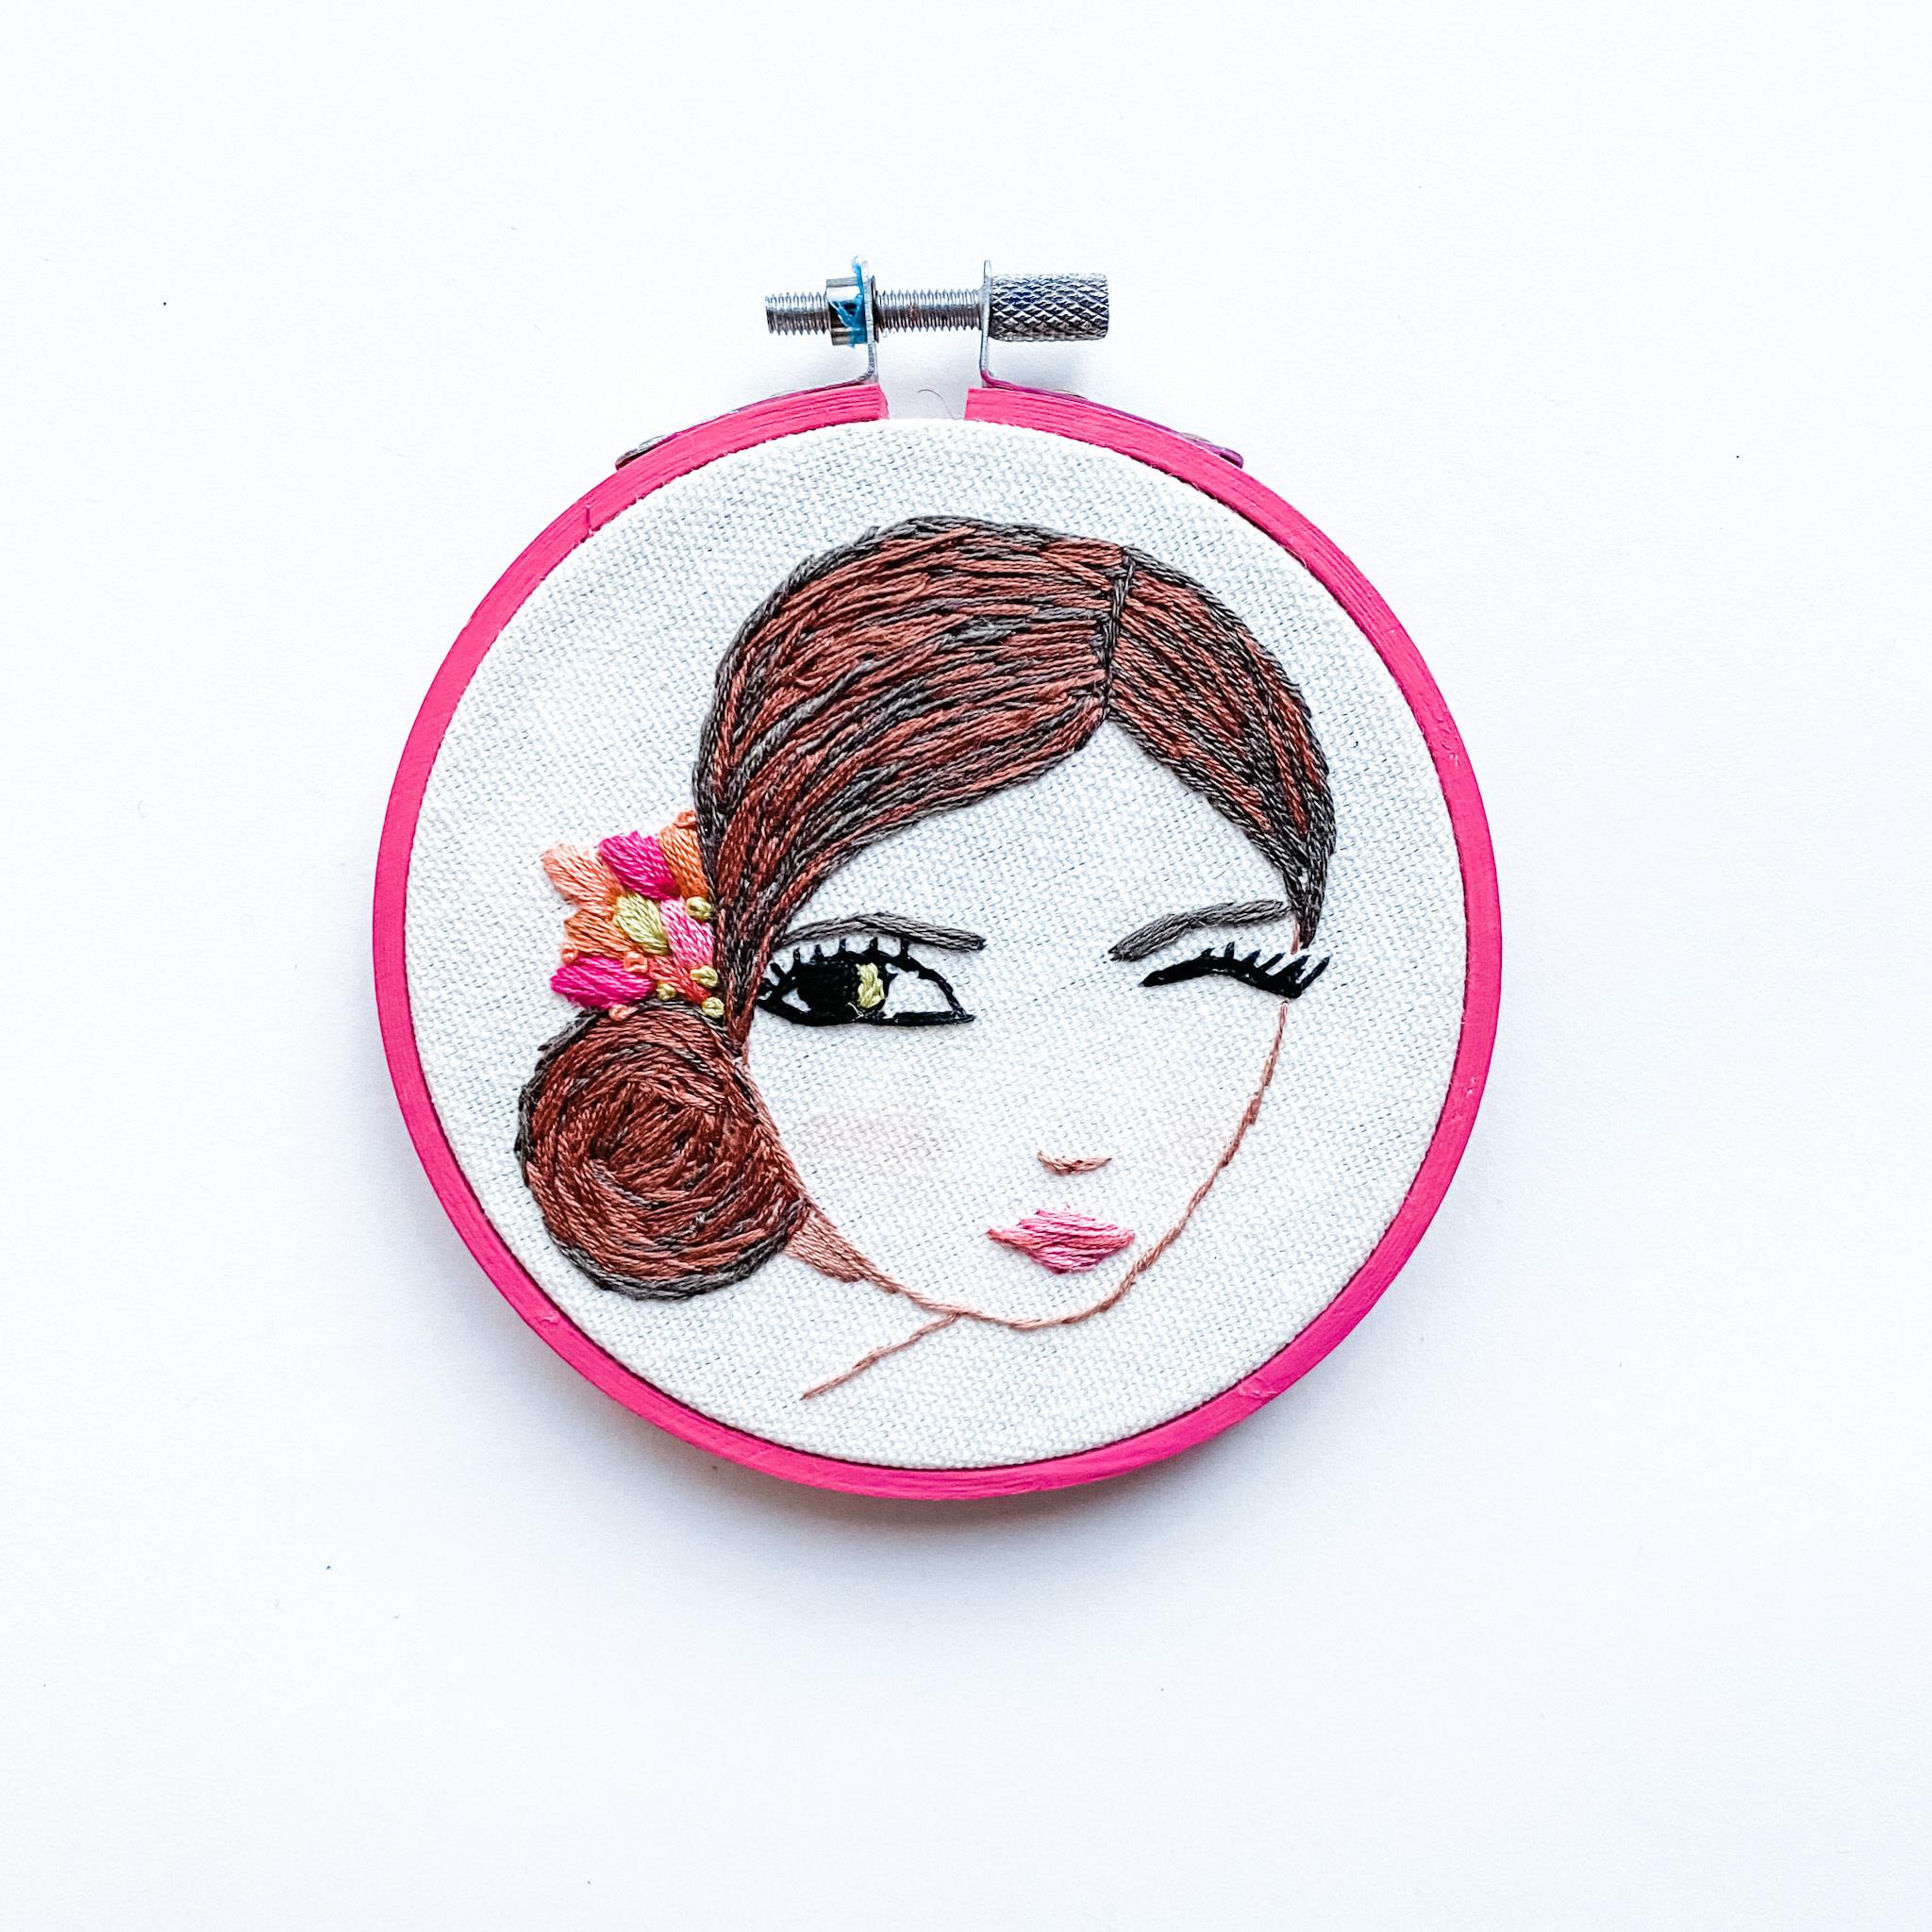 "Embroidered Hoop 4"" - Wink"